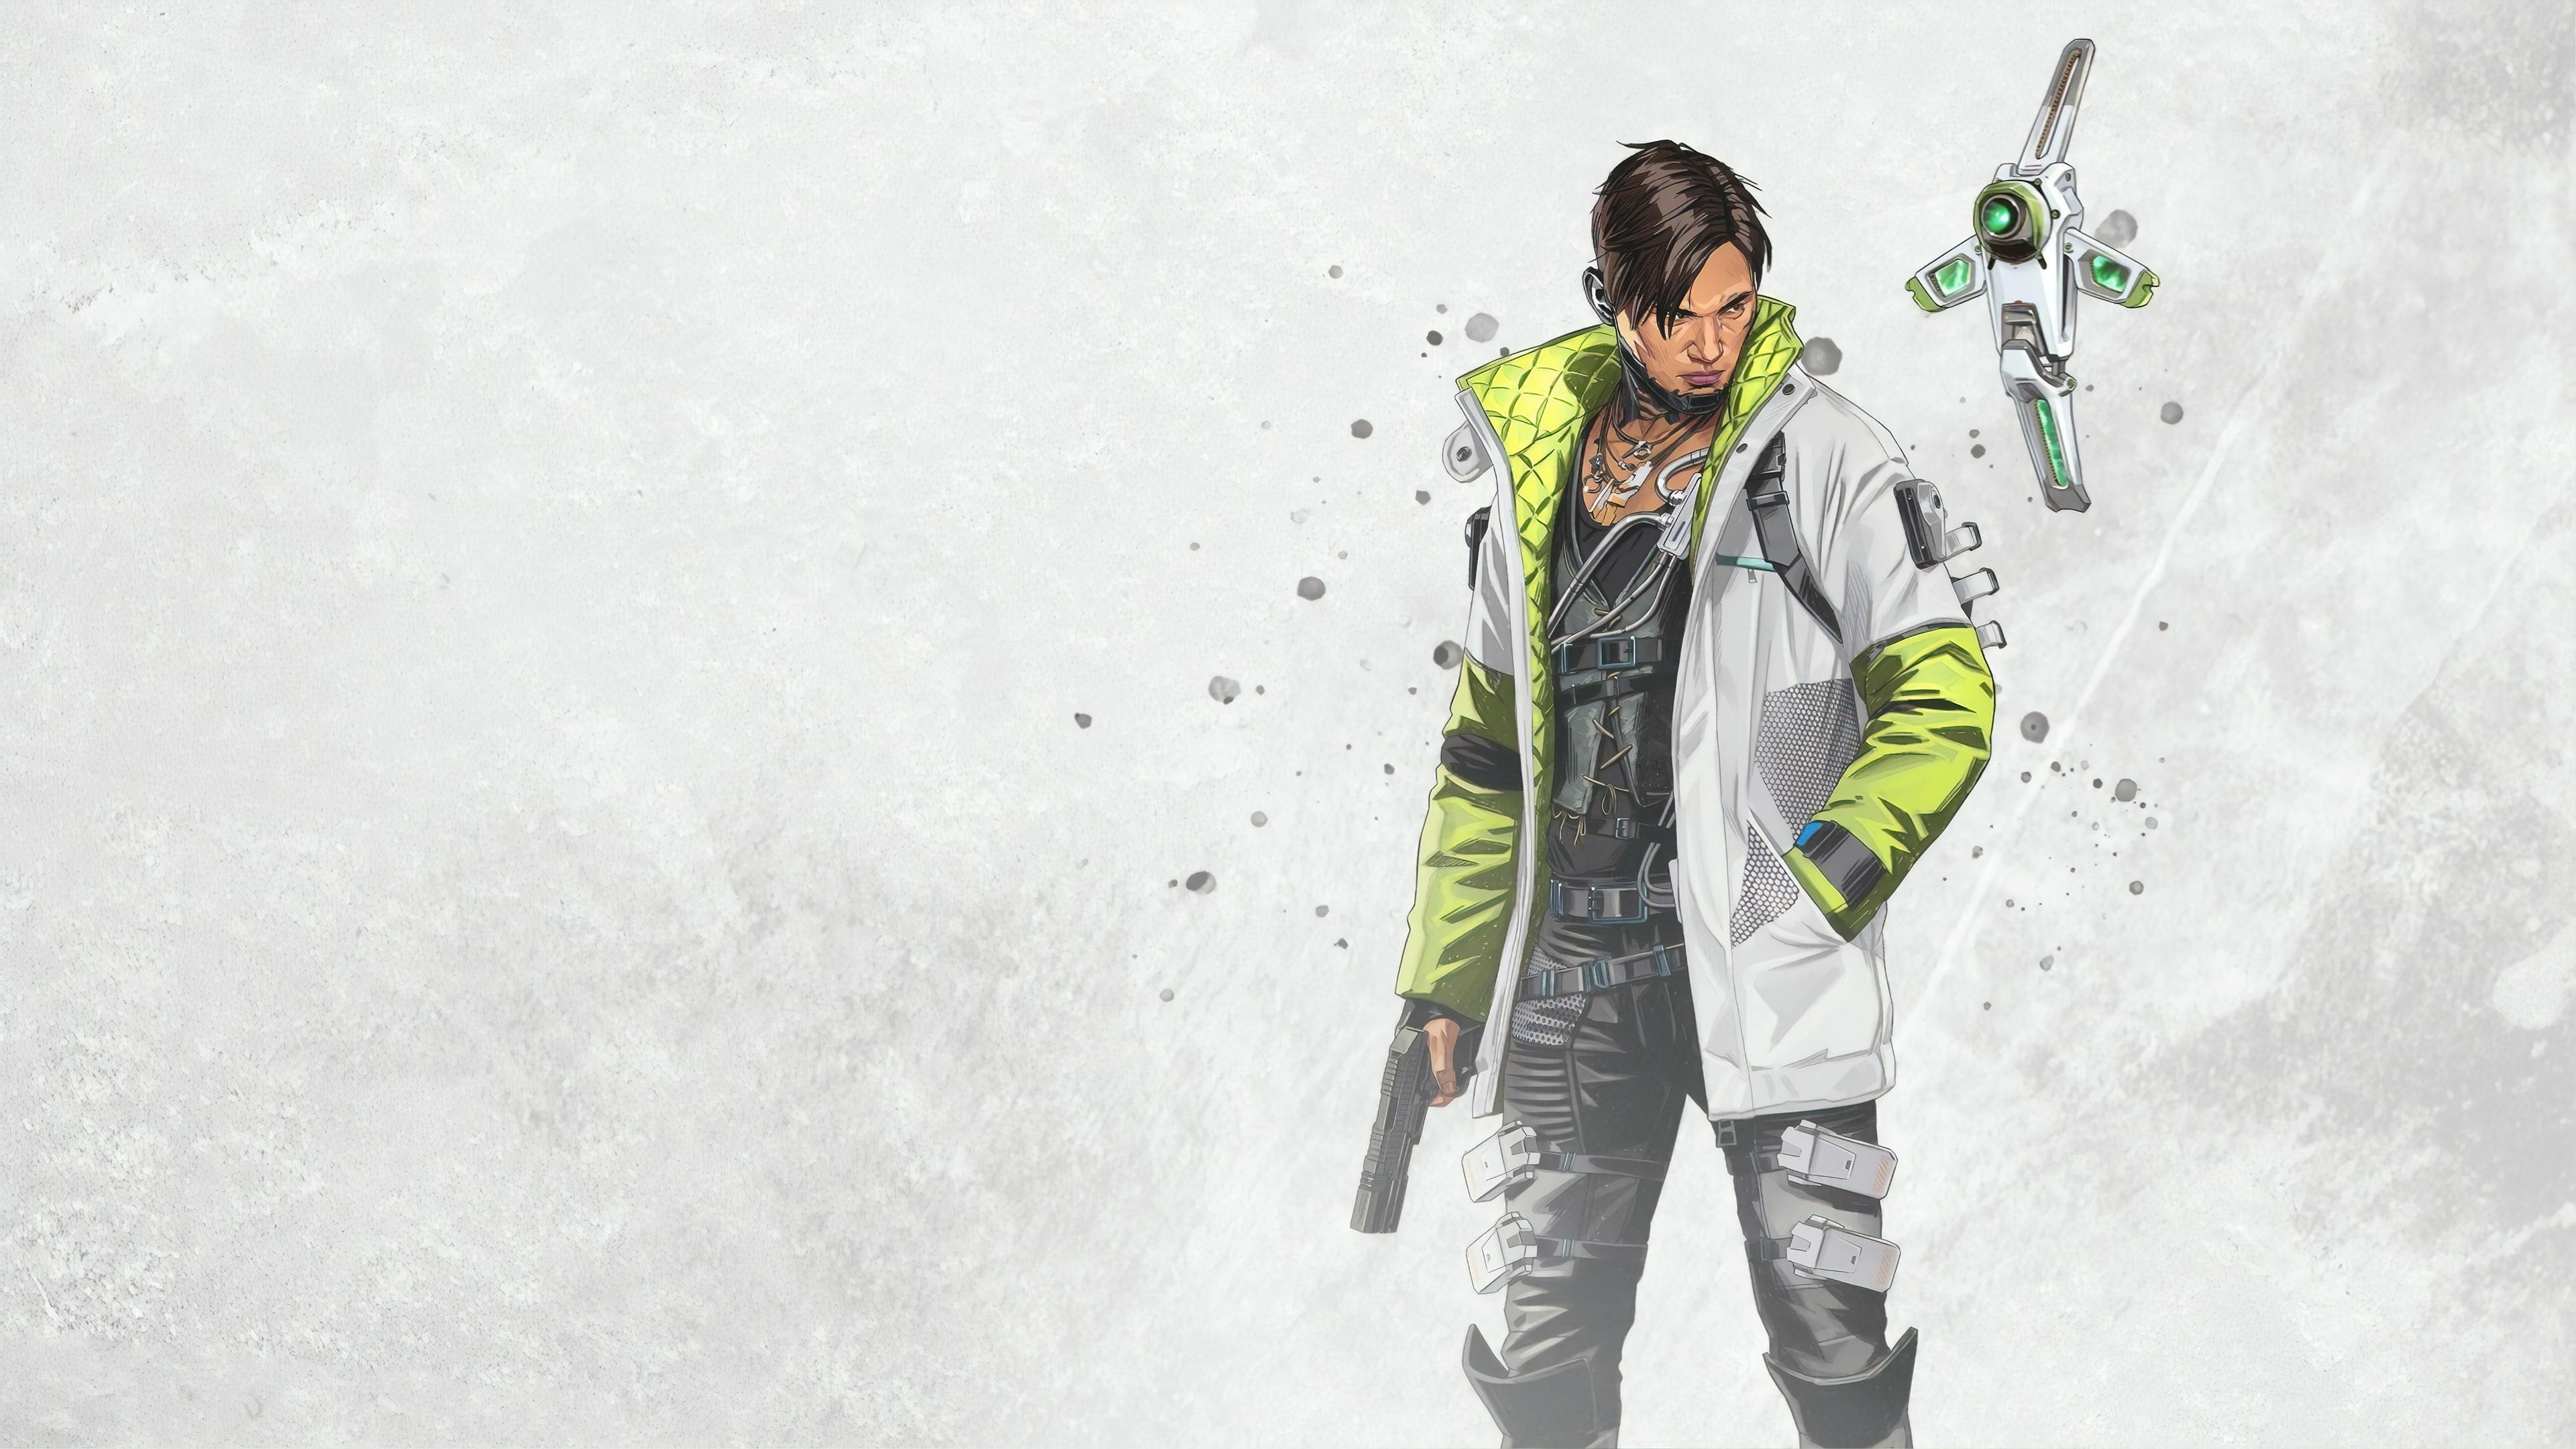 Apex Legends Season 3 Hd Games 4k Wallpapers Images